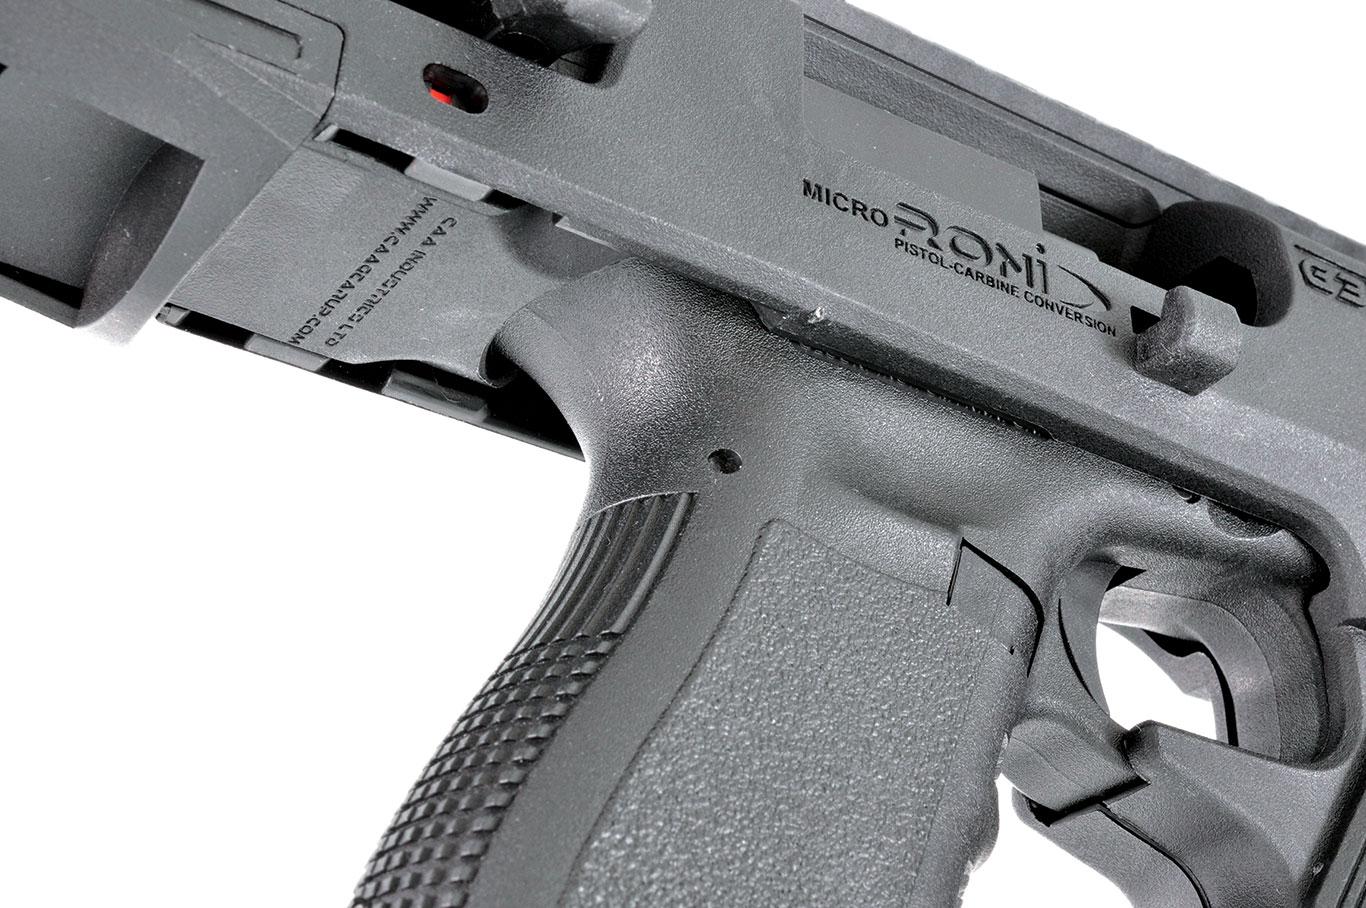 CAA-Micro-Roni-Stabilizer-12